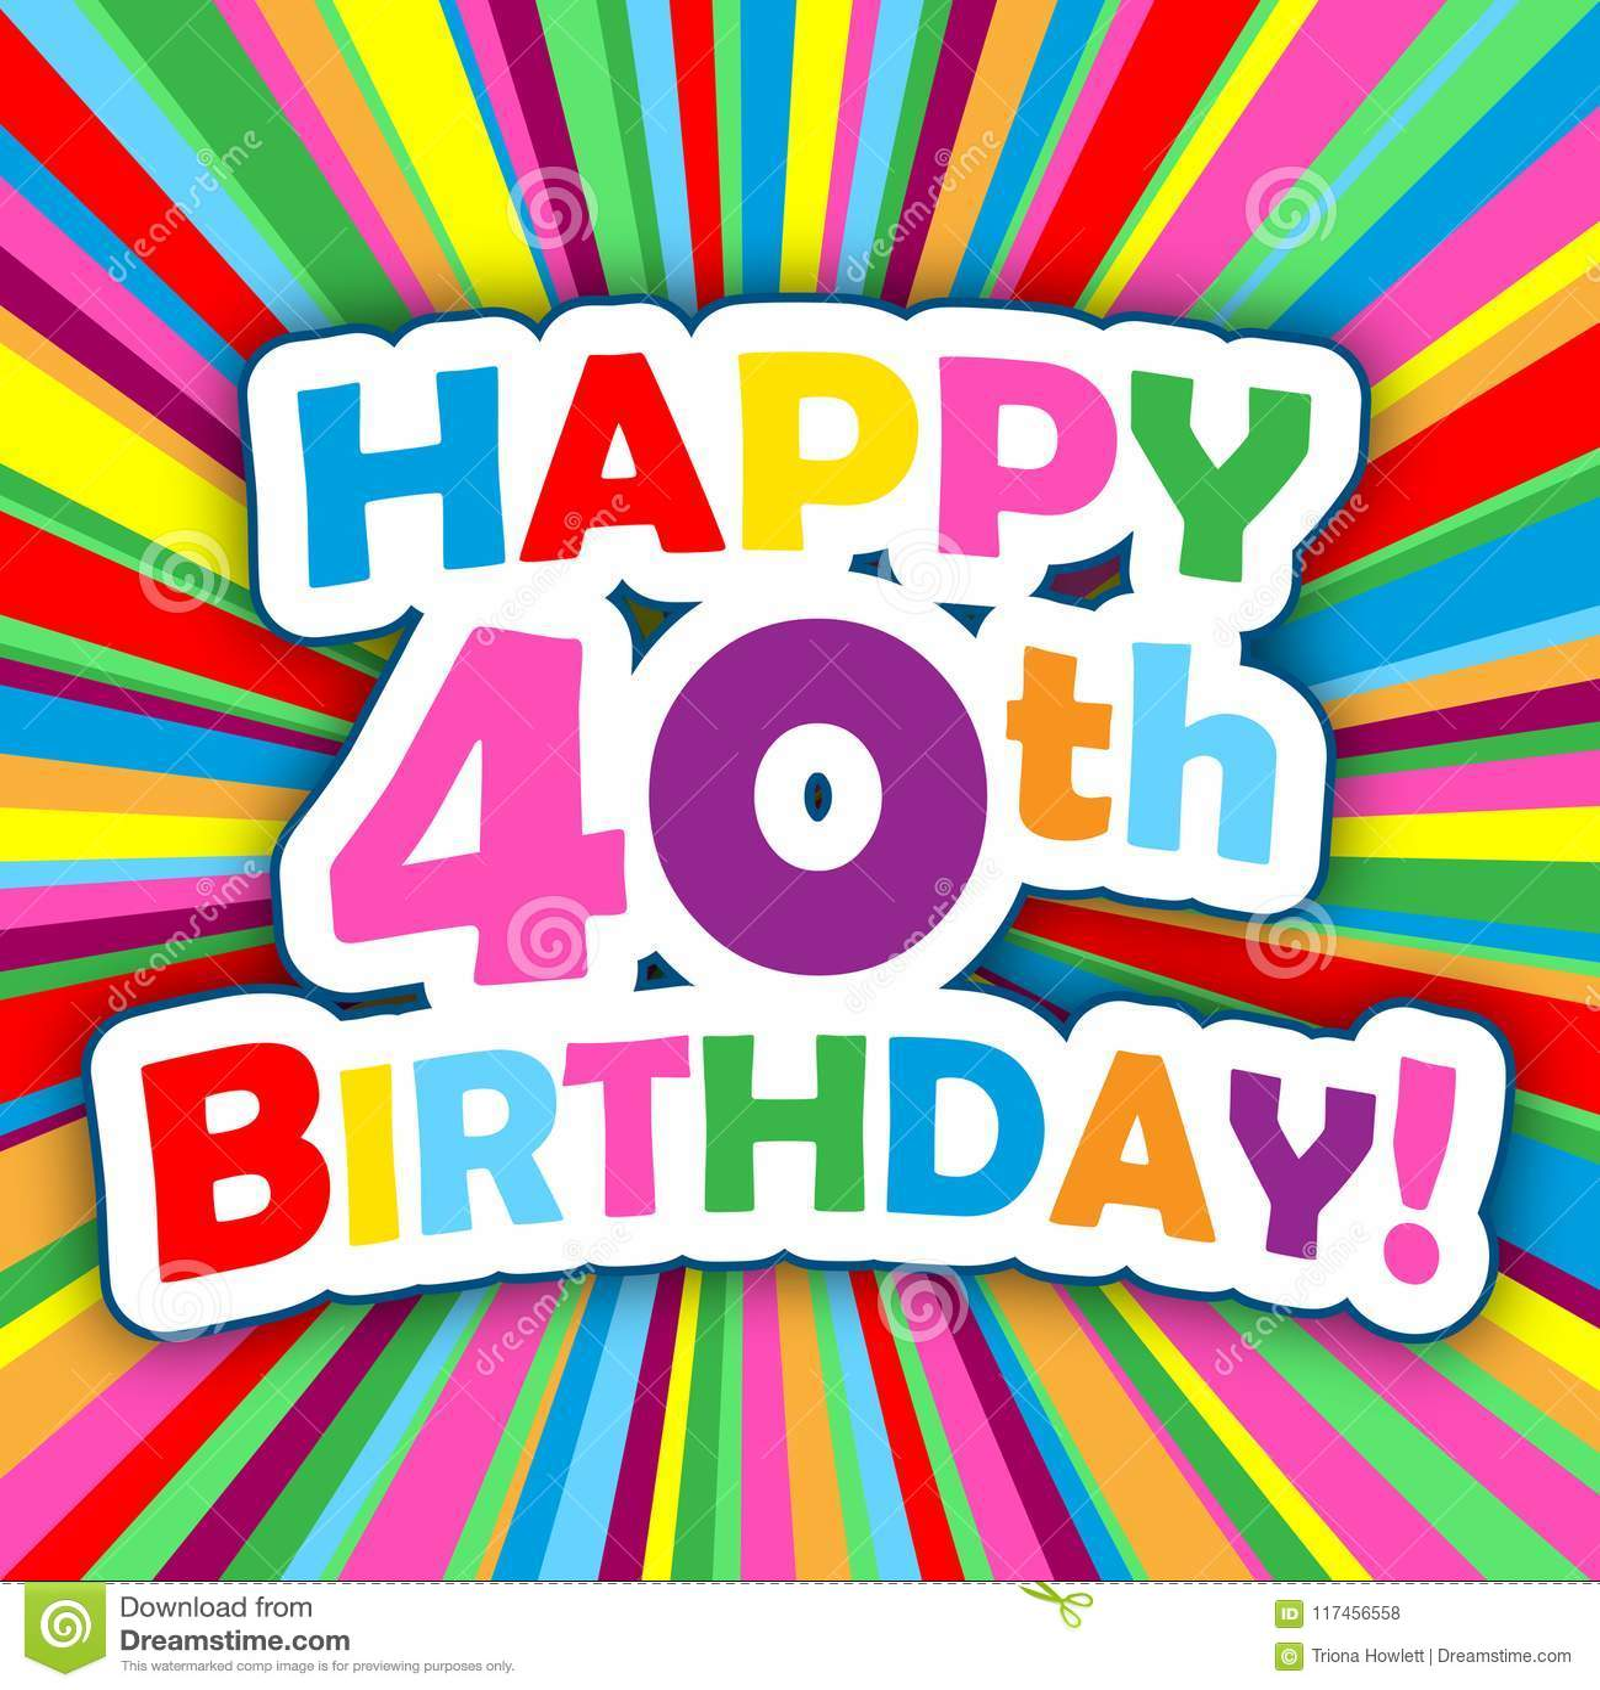 40th Birthday Stock Illustrations 2 412 40th Birthday Stock Illustrations Vectors Clipart Dreamstime